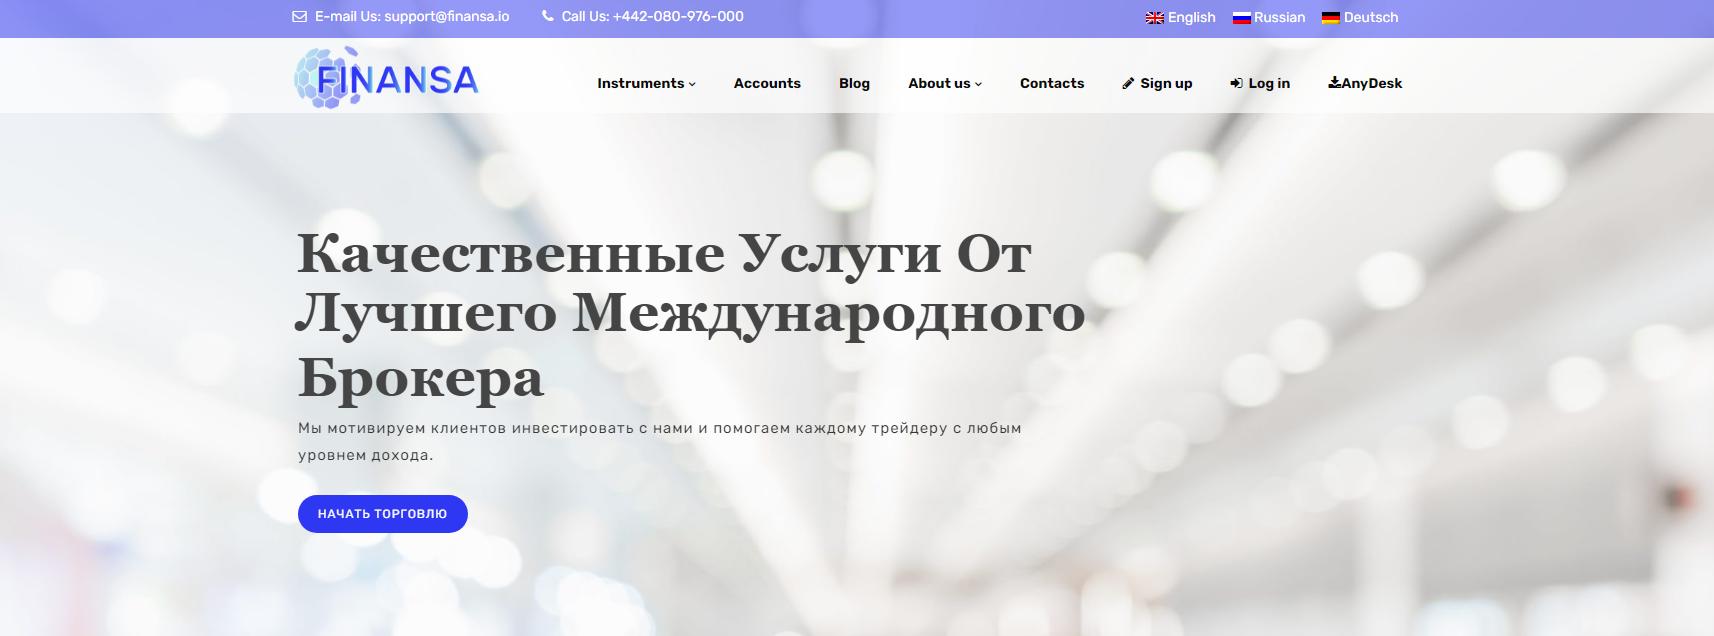 Сайт компании Finansa